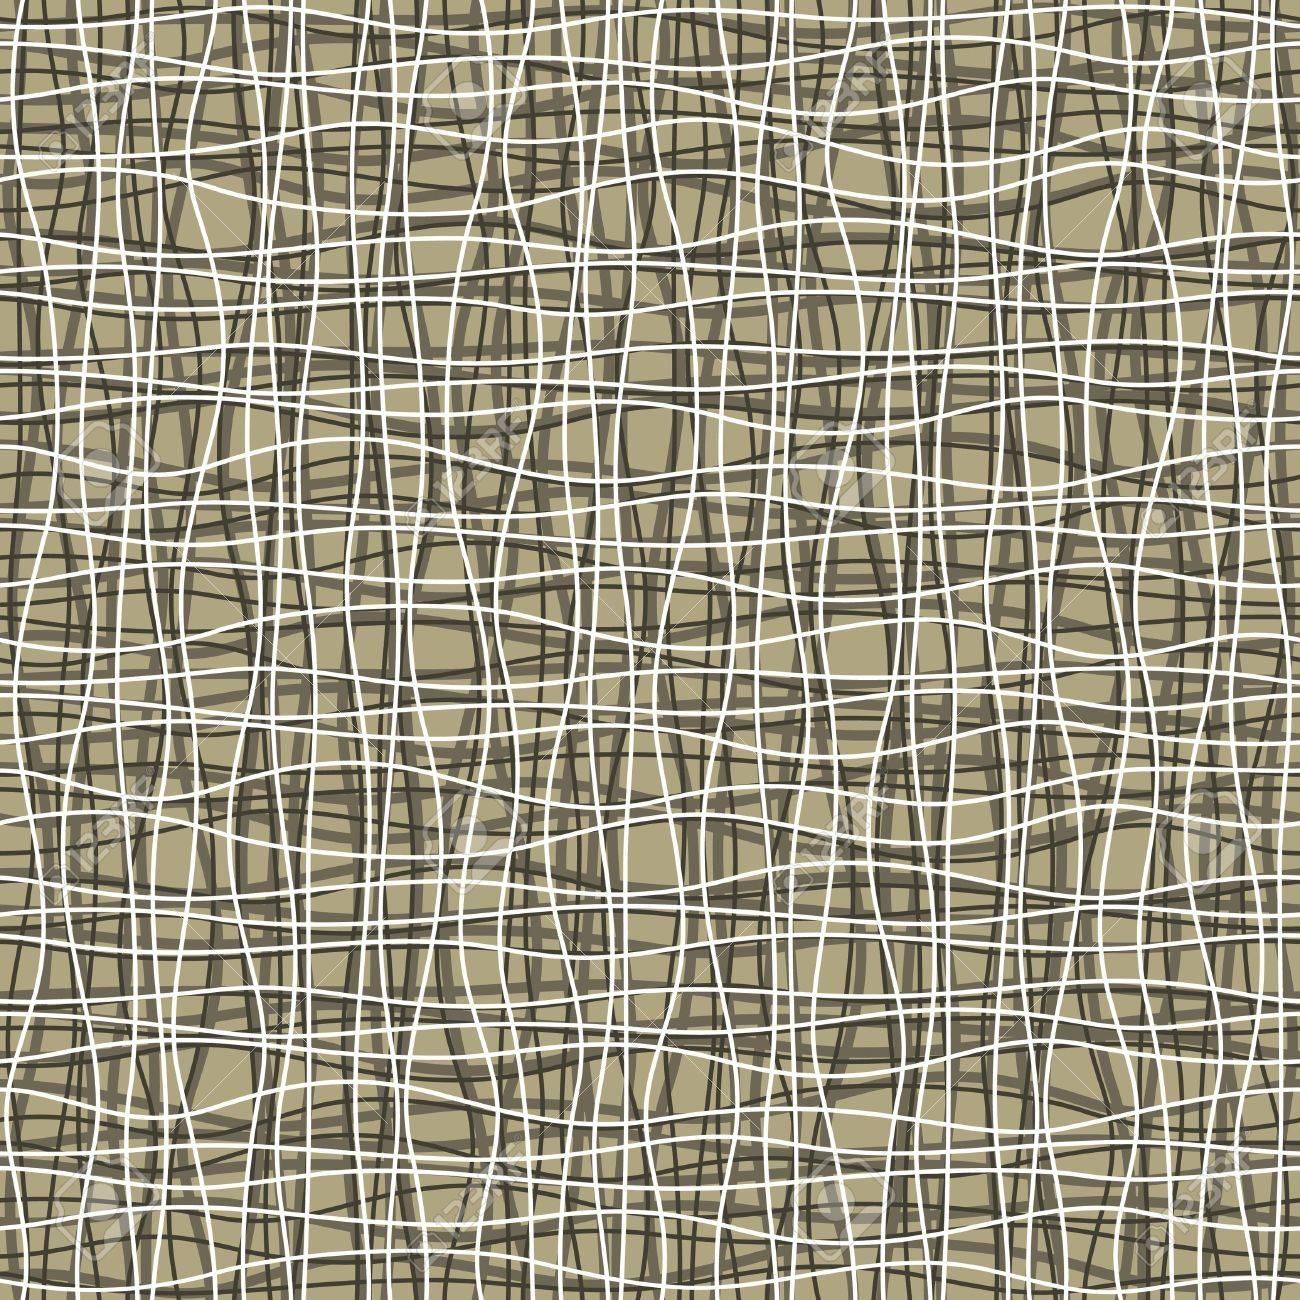 Carta Da Parati Moderna Texture.Vettoriale Sfondo Senza Soluzione Di Continuita Da Una Astrazione